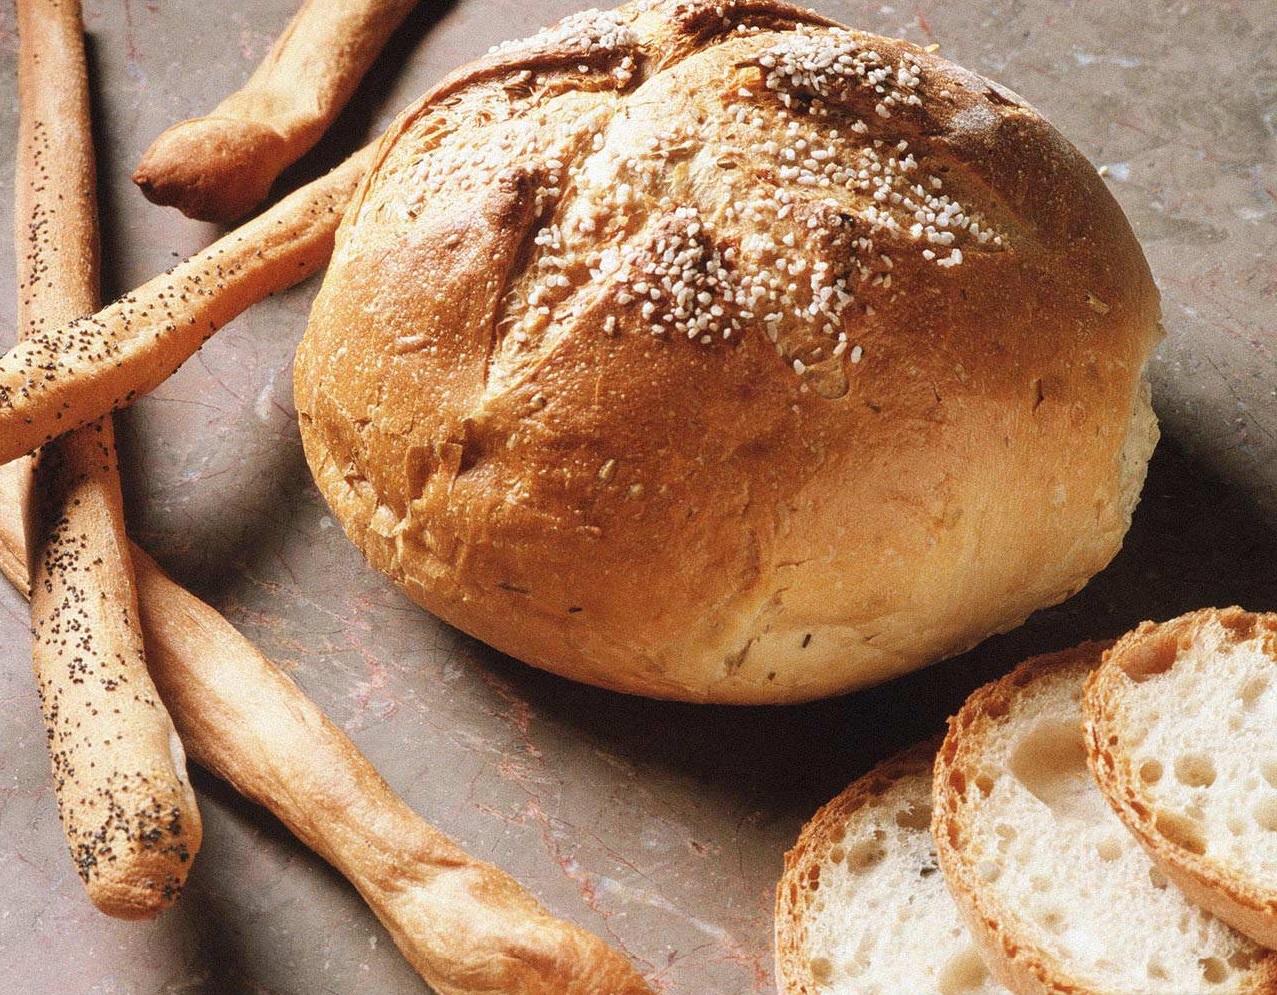 Как приготовить домашний хлеб без хлебопечки